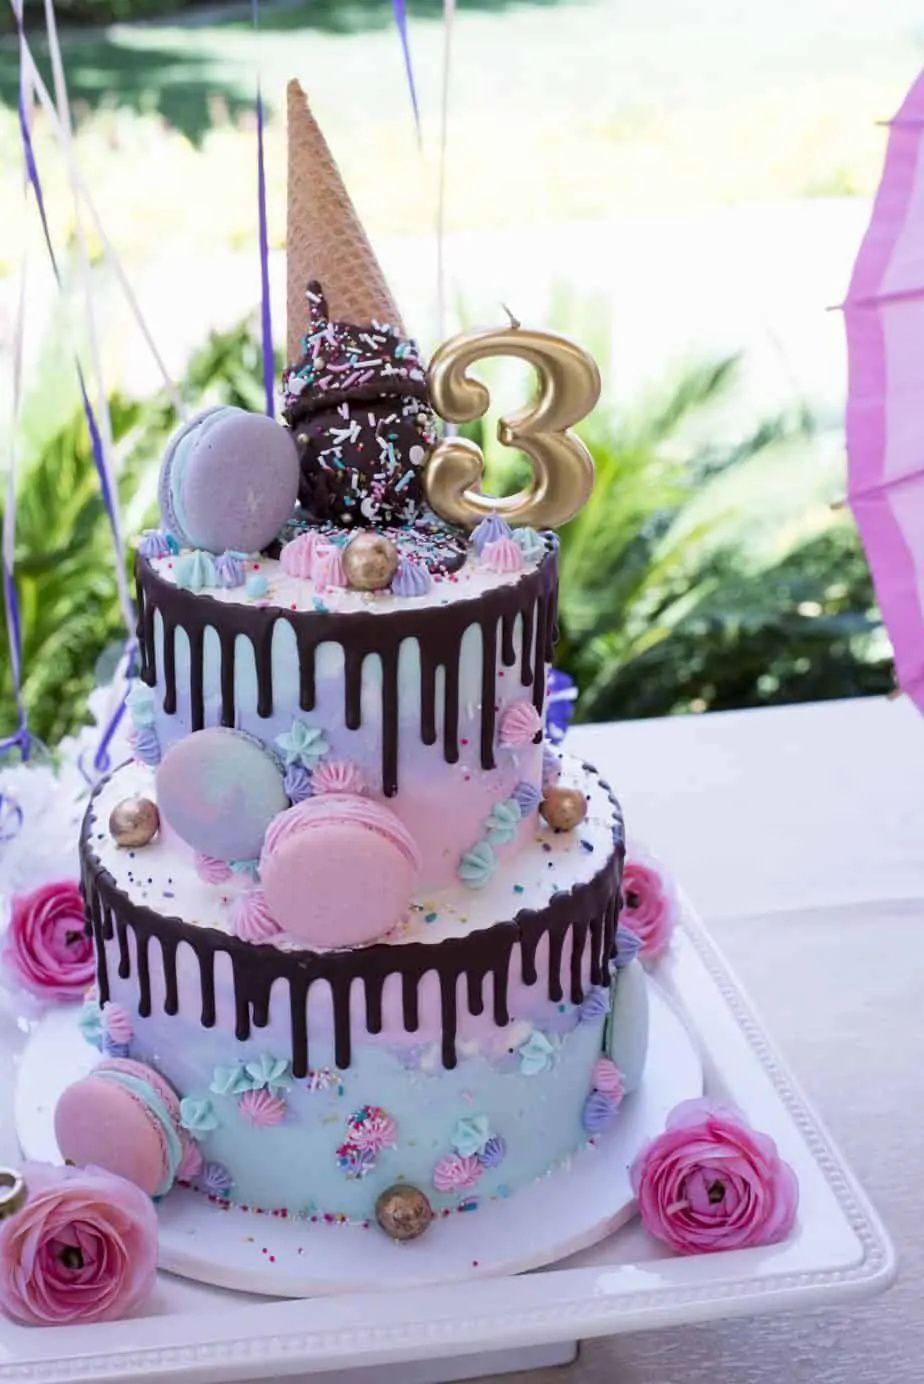 Best Cake Ideas For Girls Birthdays In 2021 Birthday Cake Kids Girls Little Girl Birthday Cakes Pretty Birthday Cakes